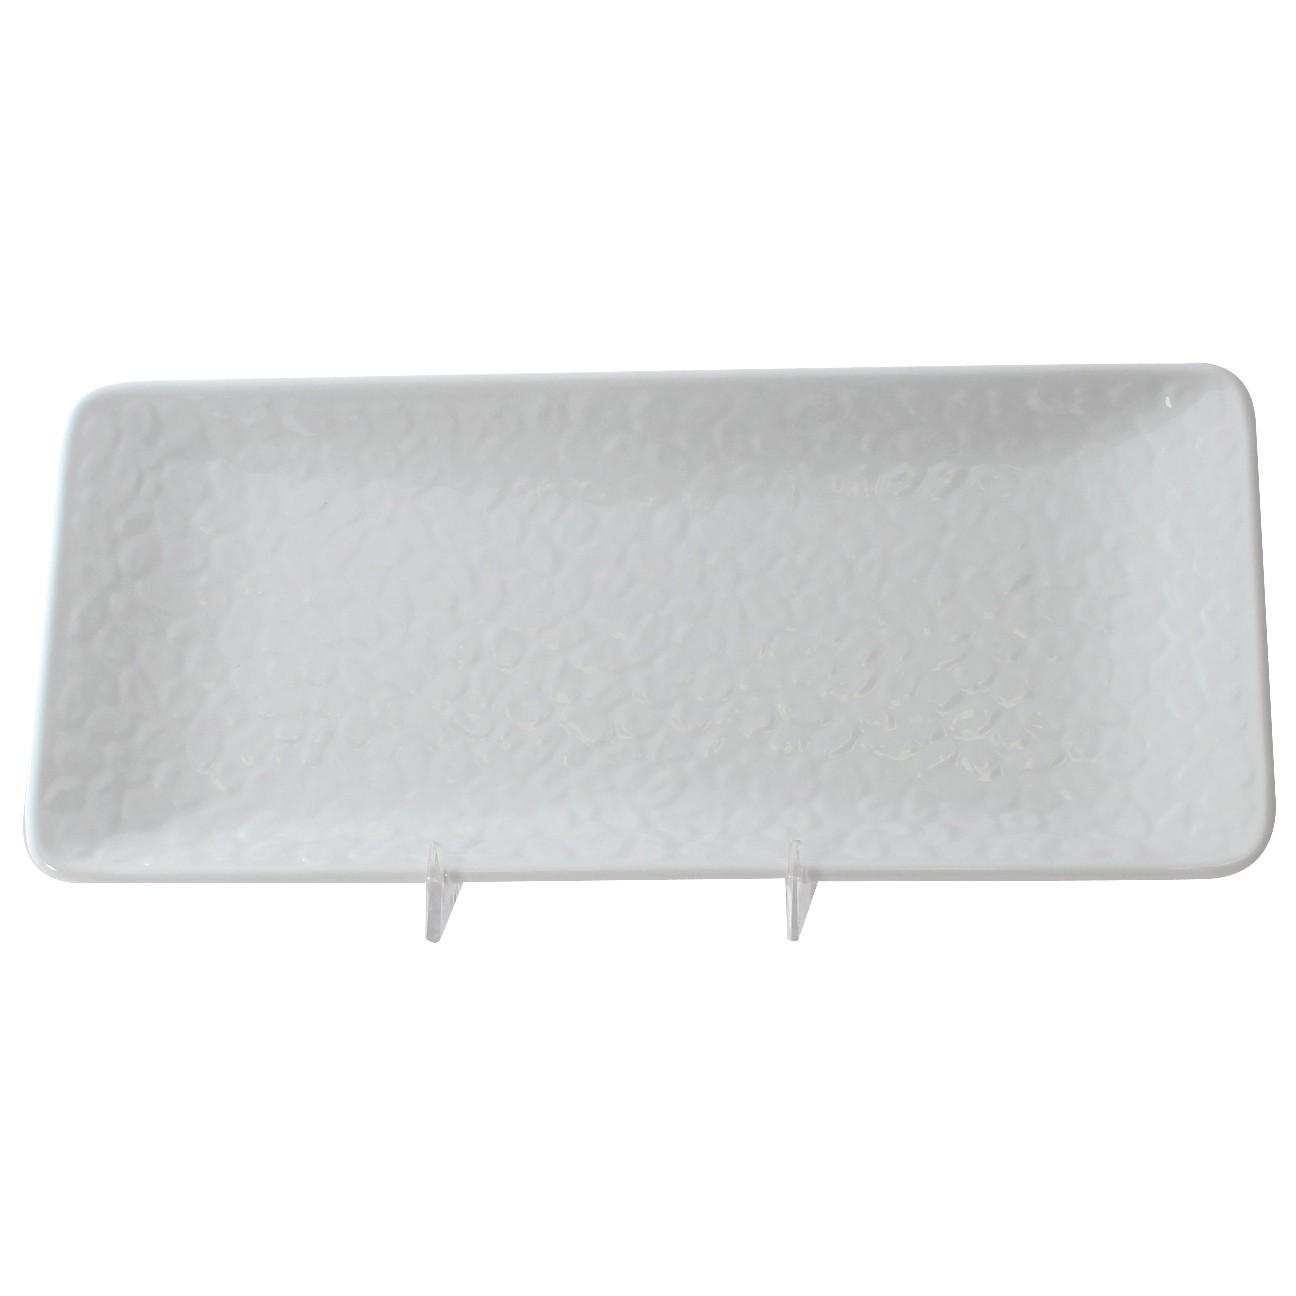 Classic White Melamine Rectangular Plate, 11-1/4